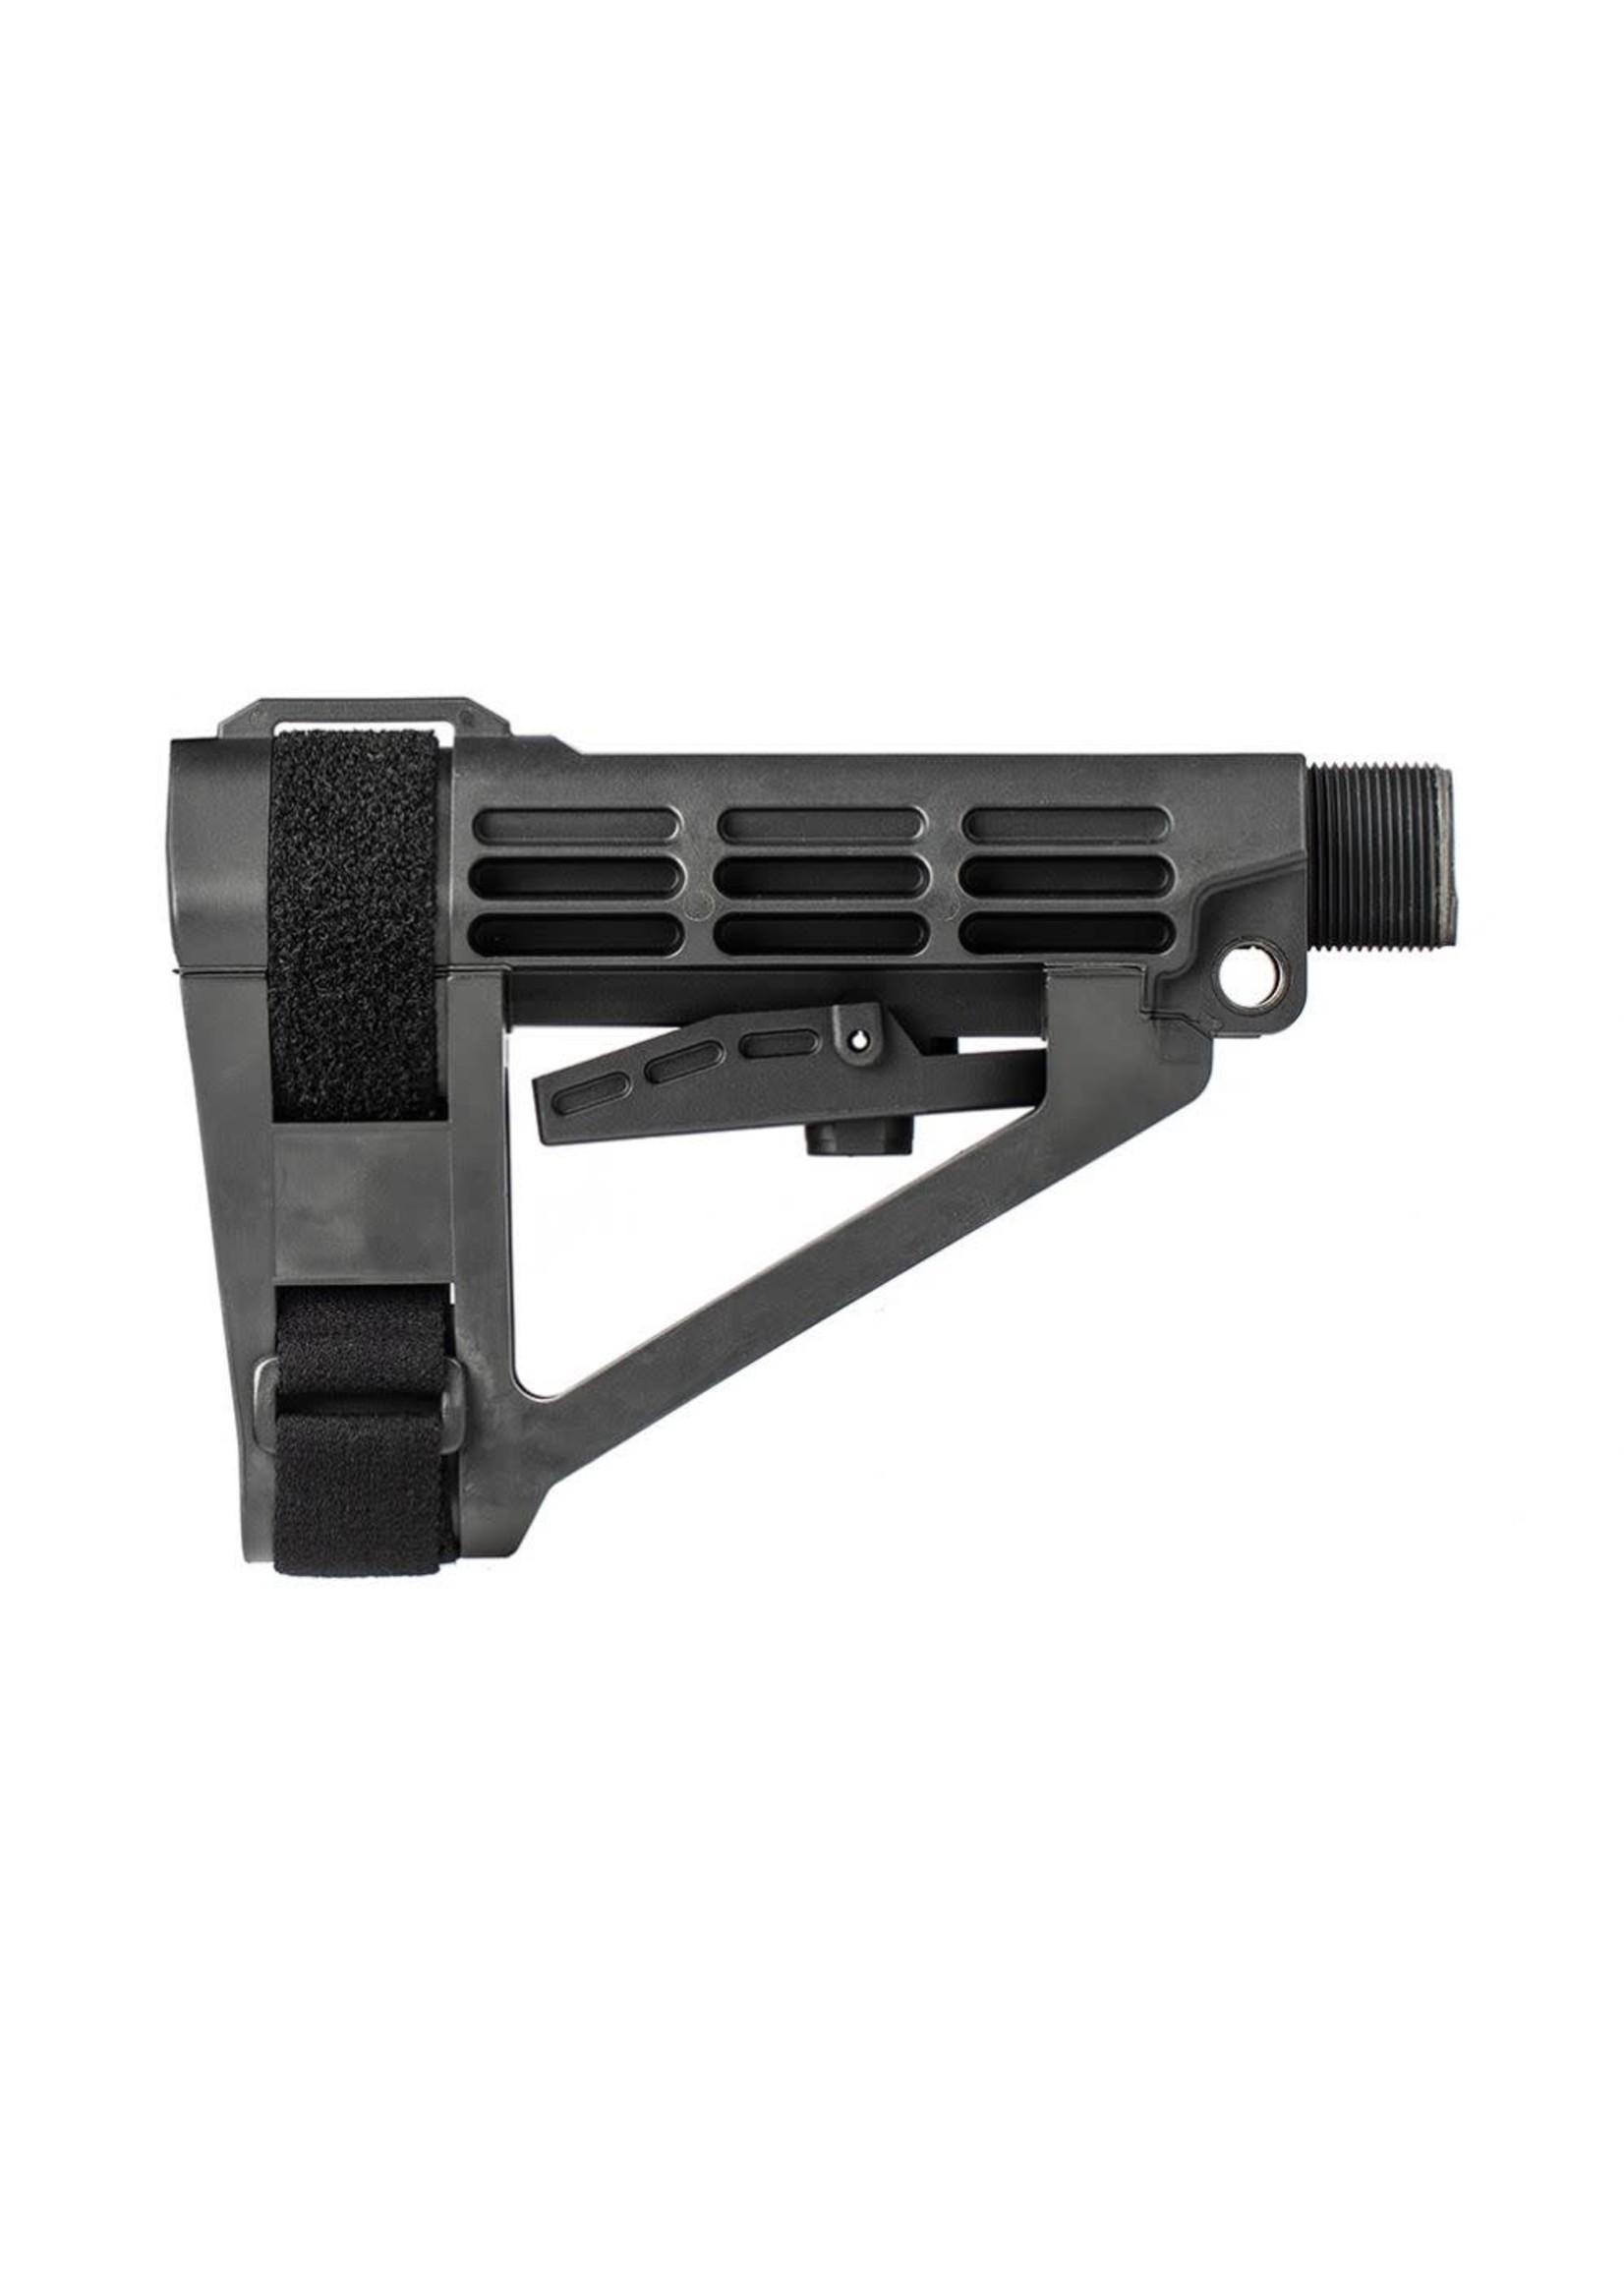 SB Tactical SB Tactical AR Brace SBA4 Pistol Stabilizing Brace w/ Mil-Spec Buffer Tube, black